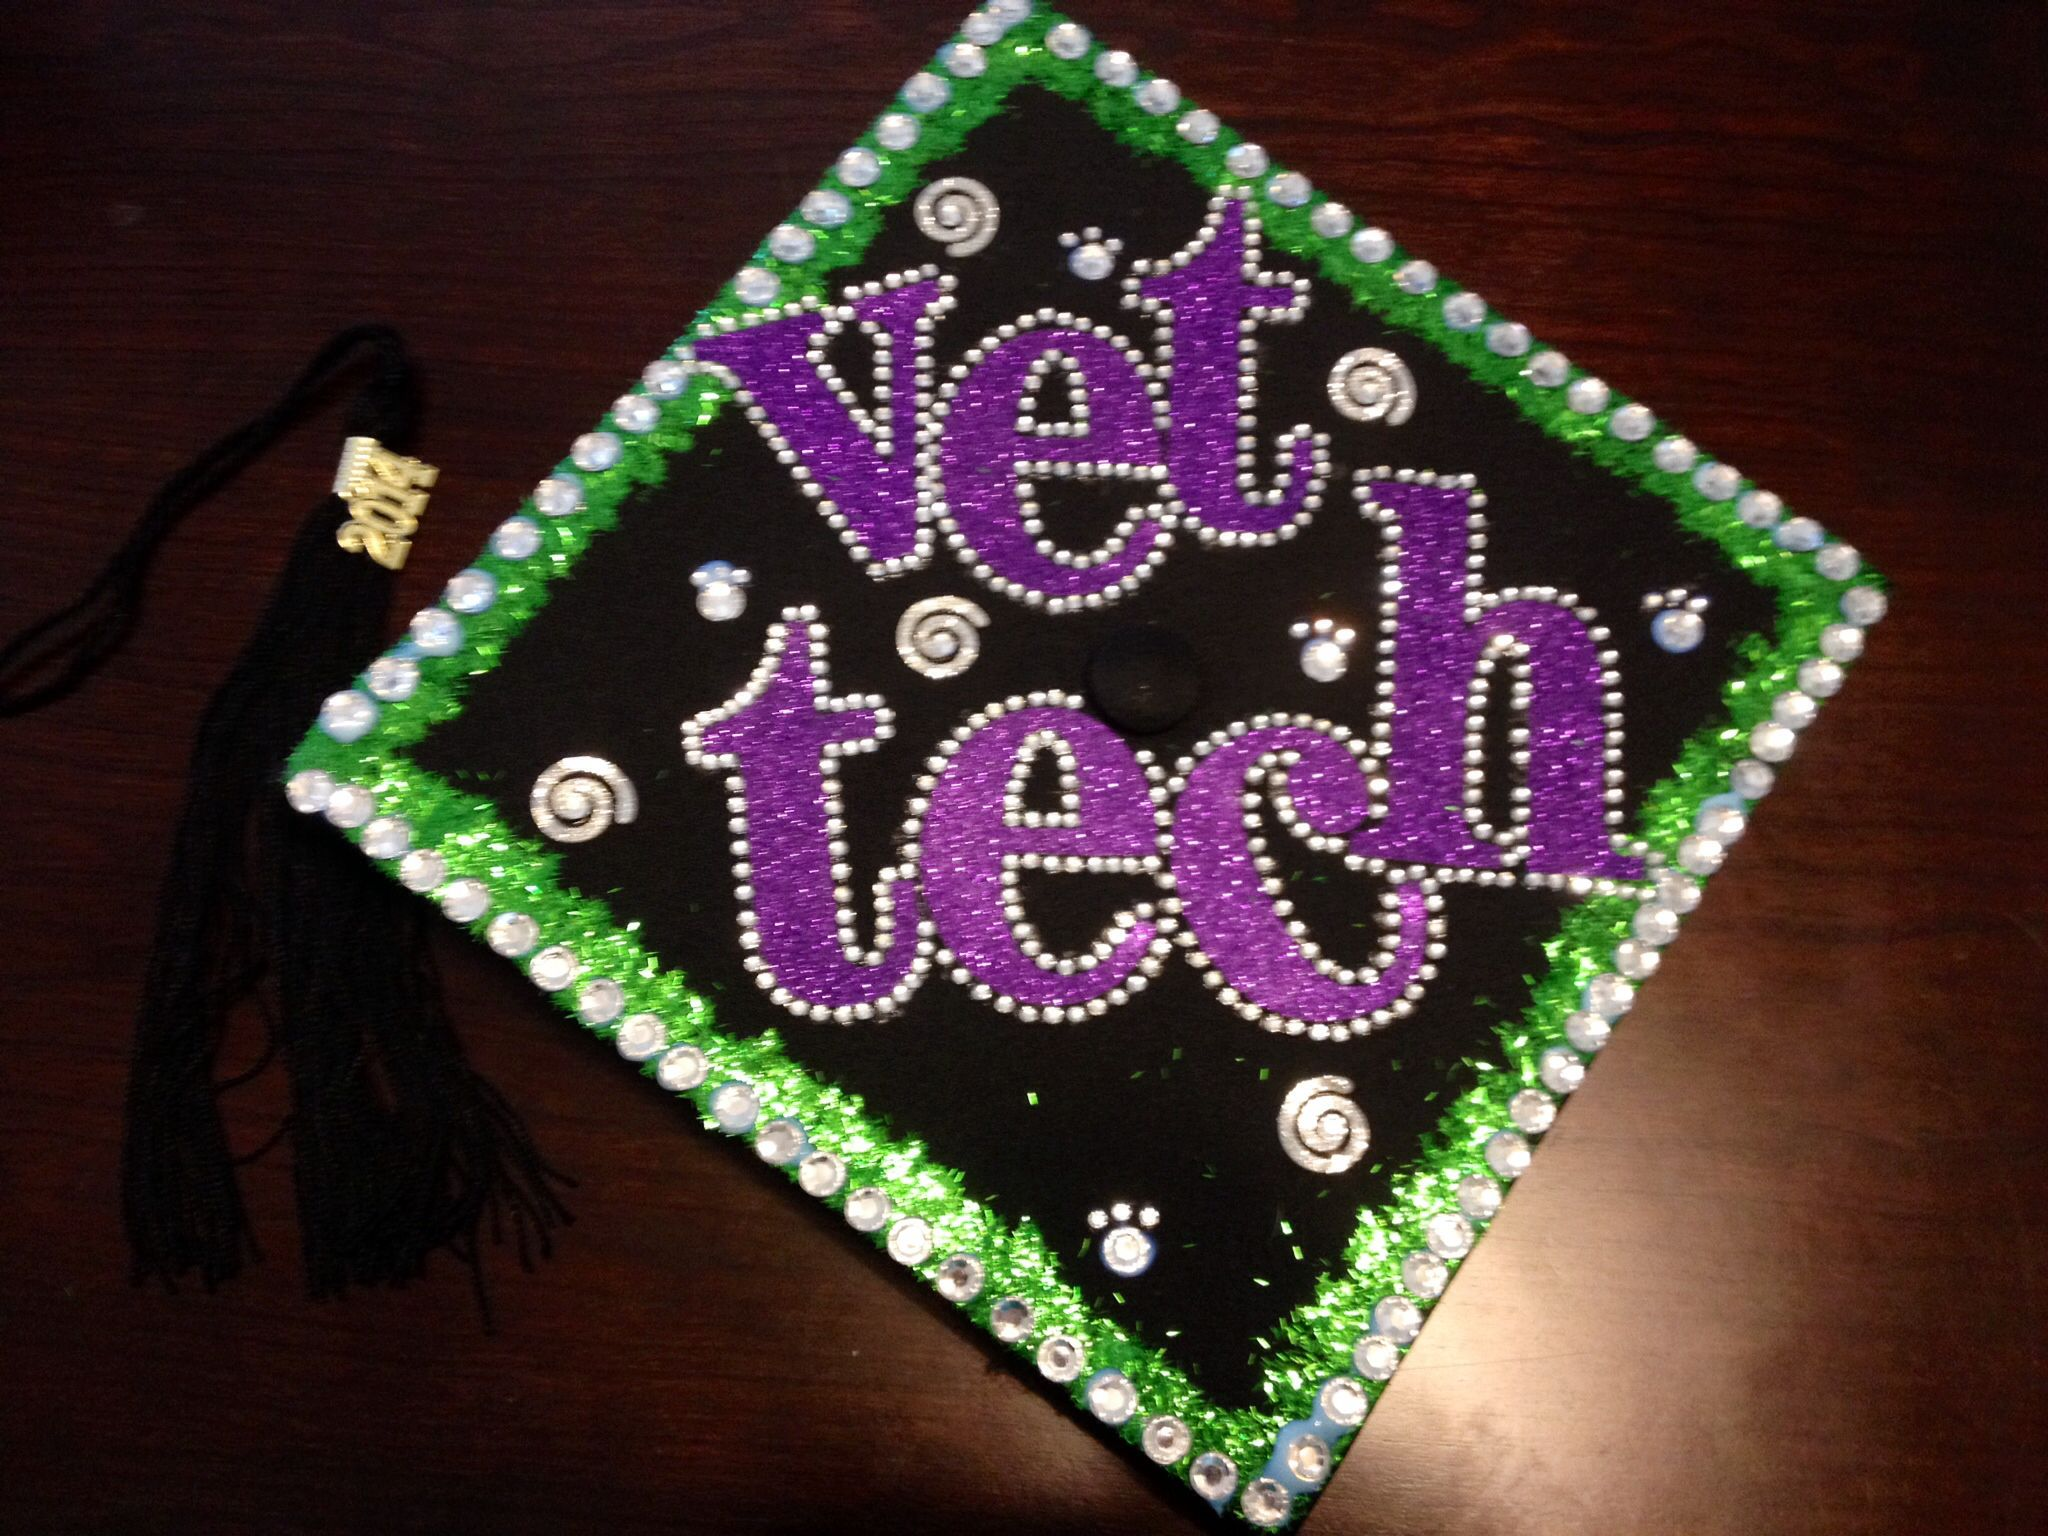 Graduation cap decoration from vet tech school  Vet Tech Life  Graduation cap decoration Grad